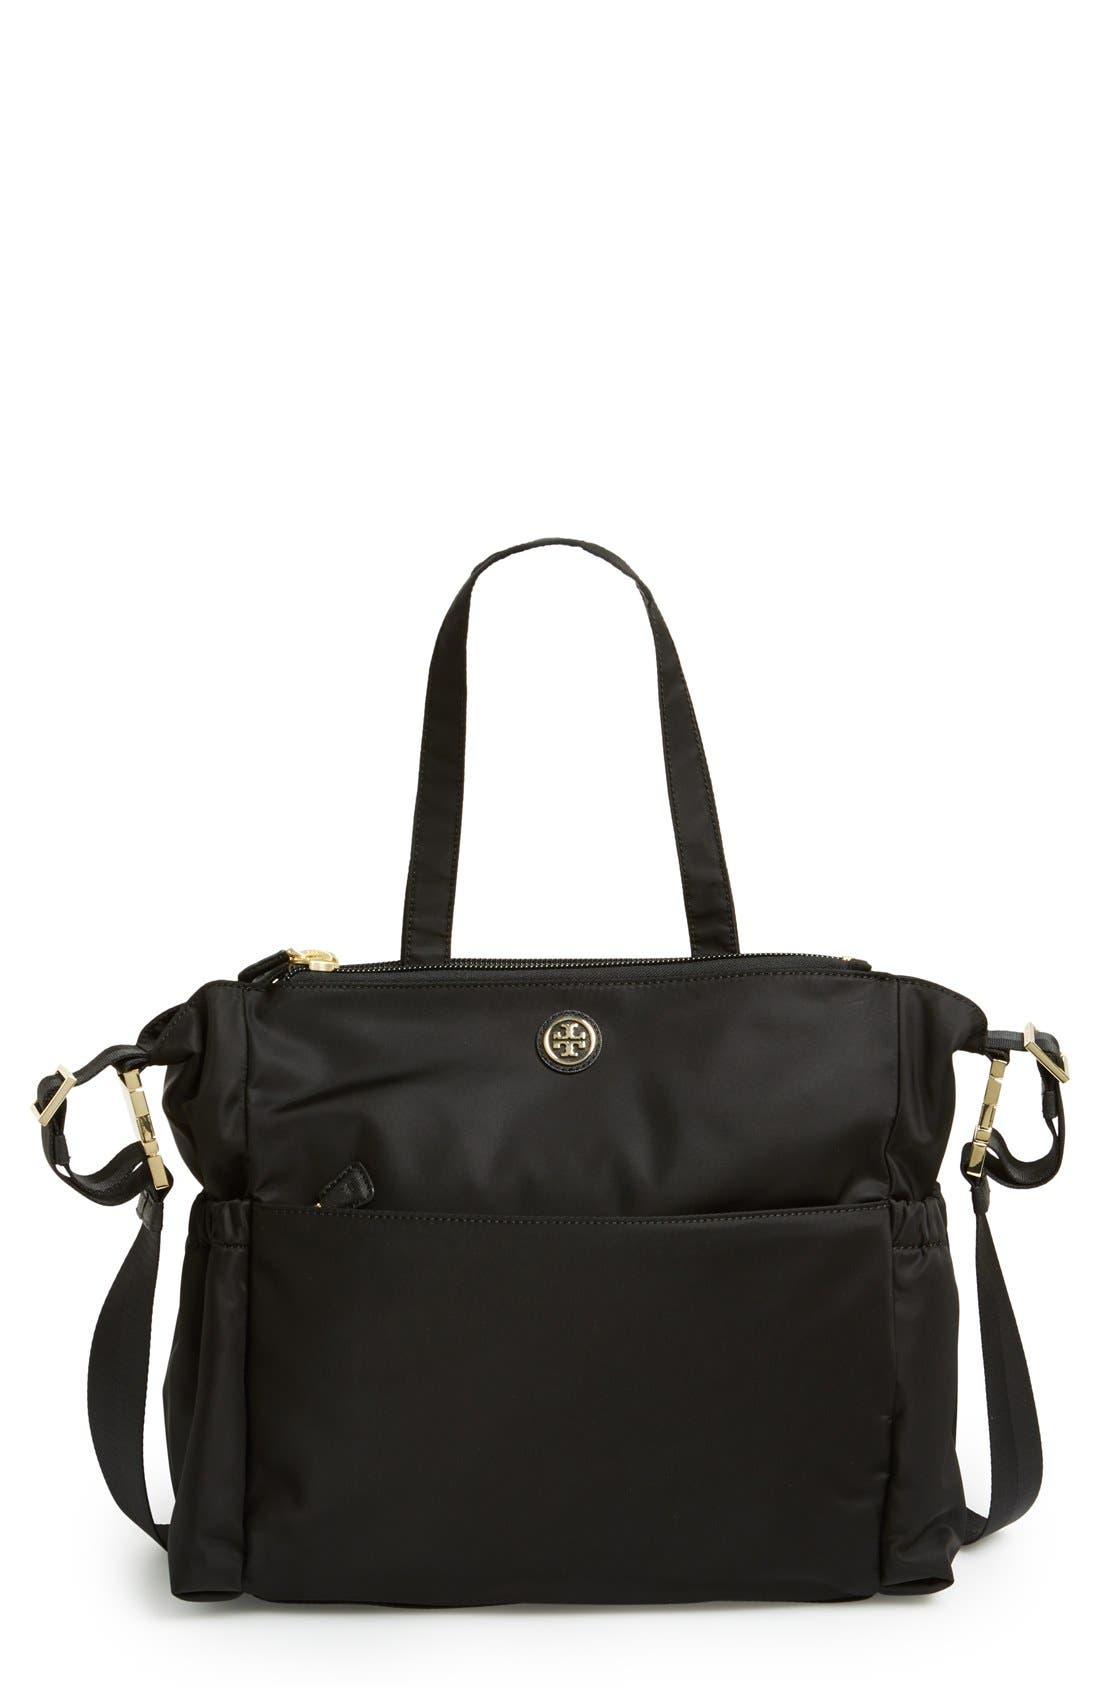 Alternate Image 1 Selected - Tory Burch Nylon Baby Bag